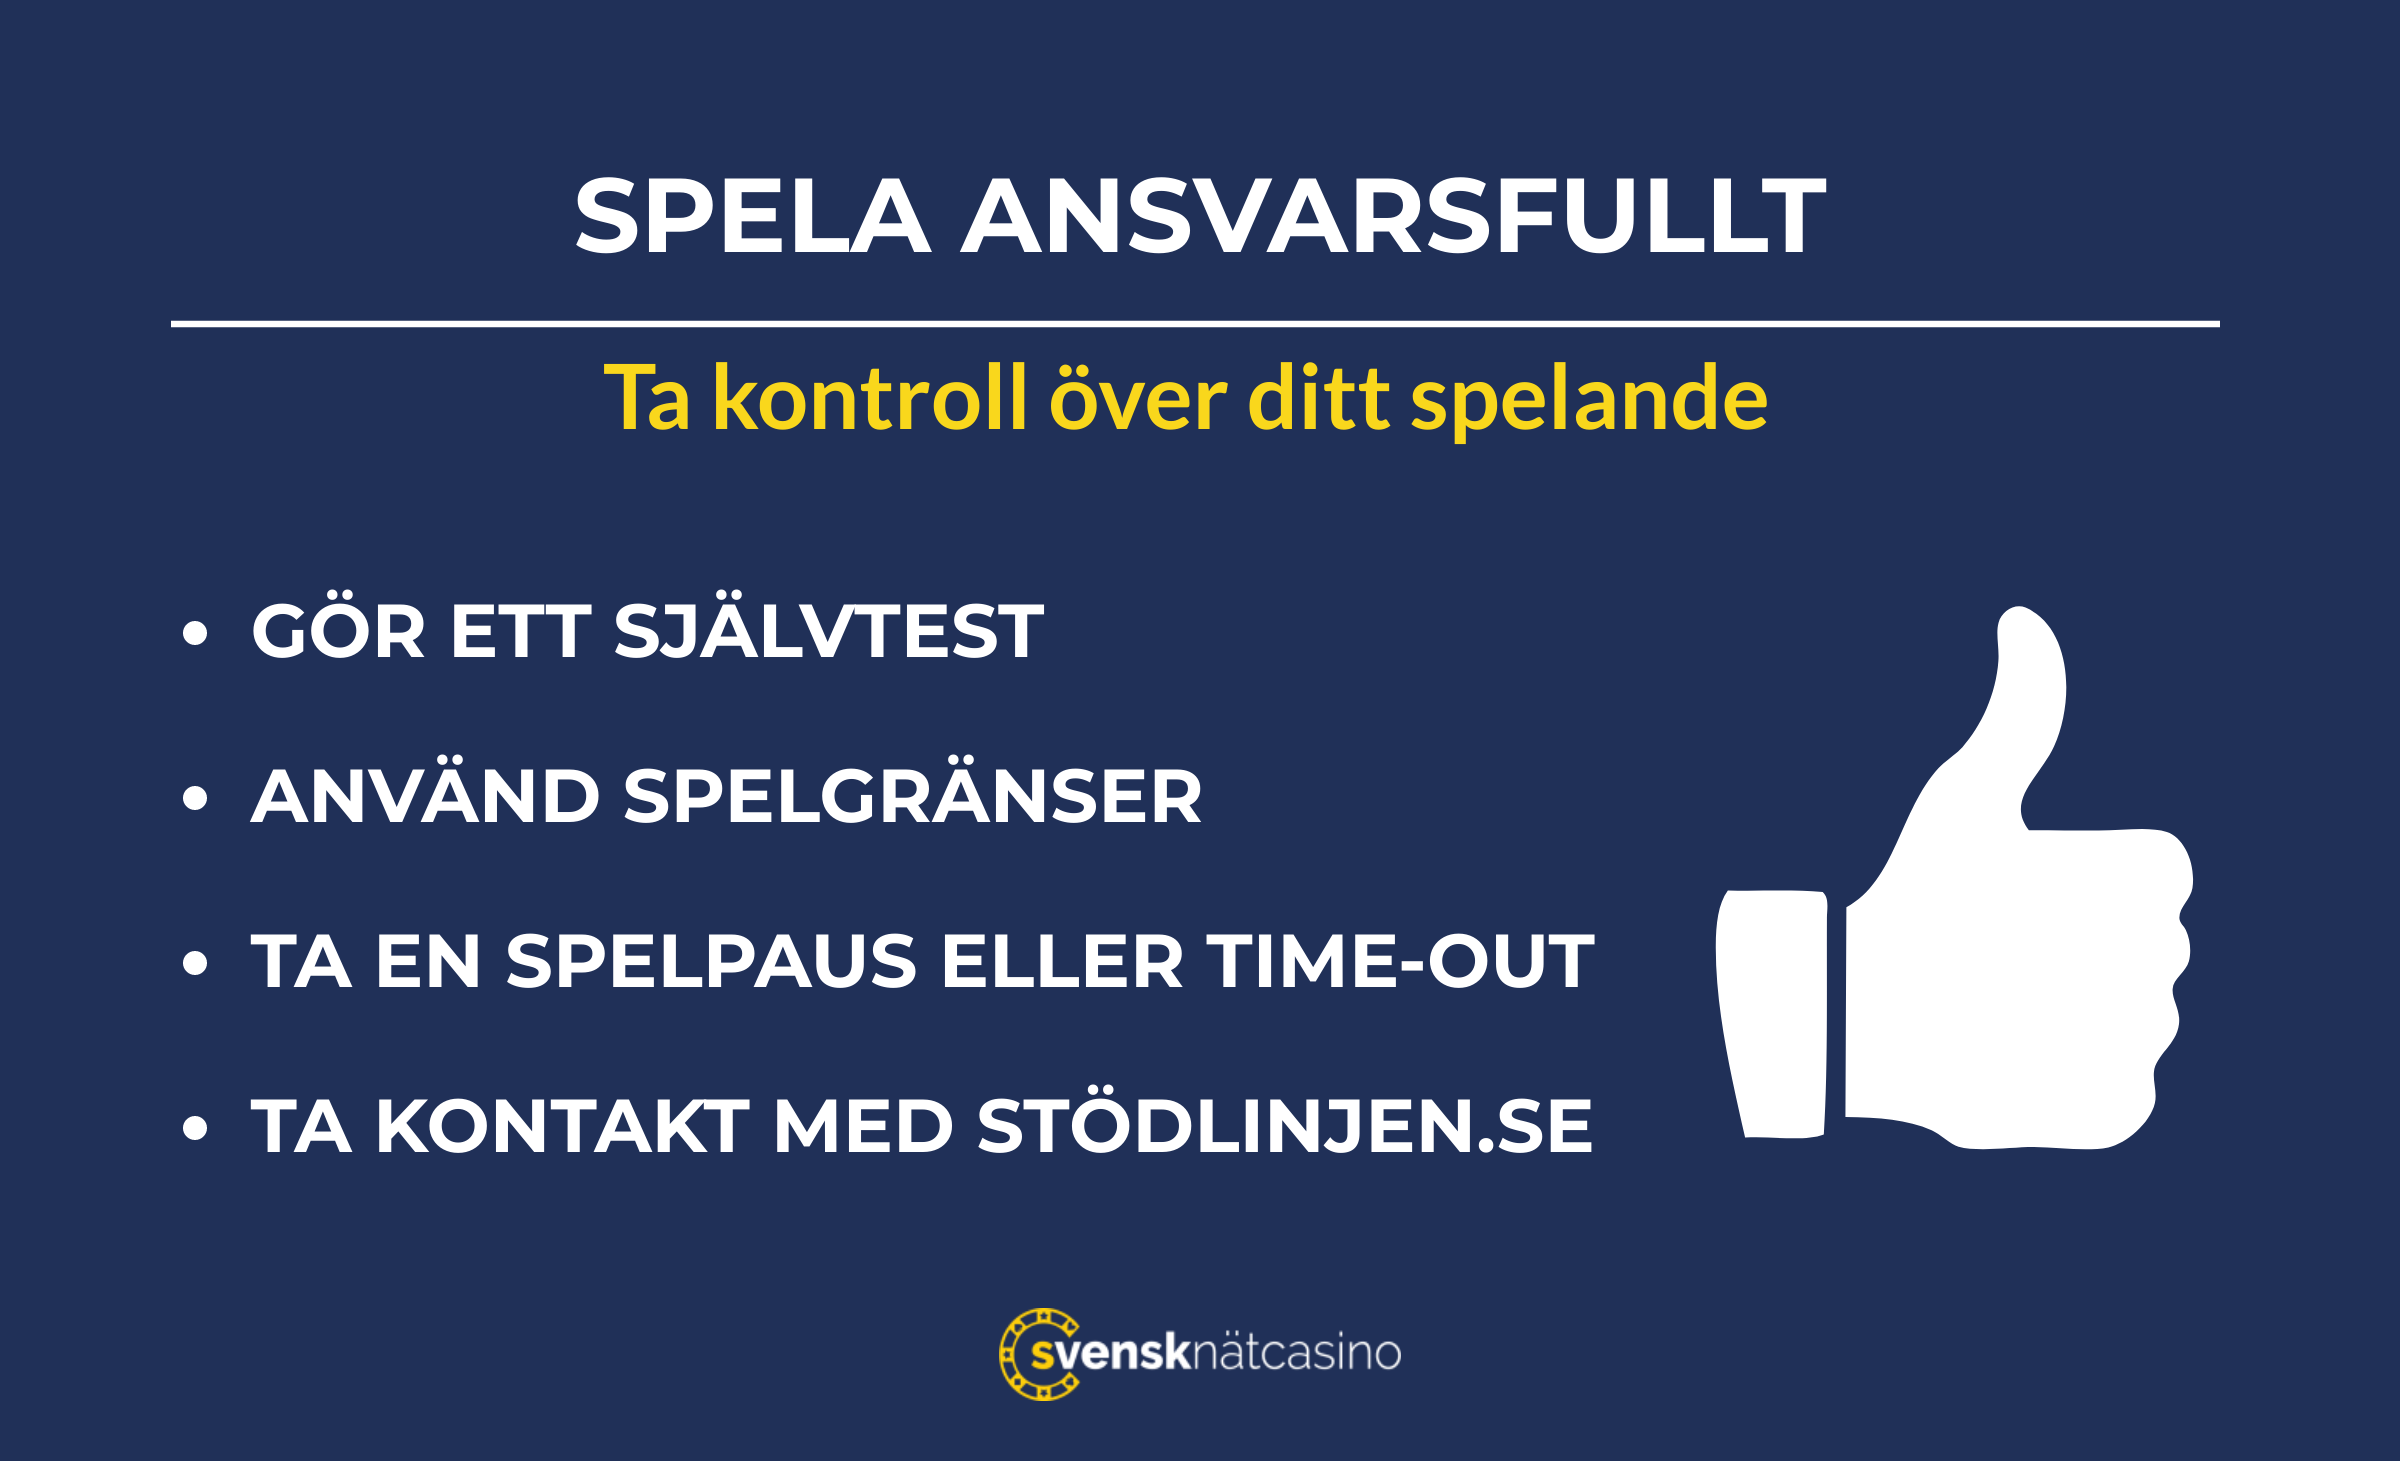 spela ansvarsfullt svensknatcasino com